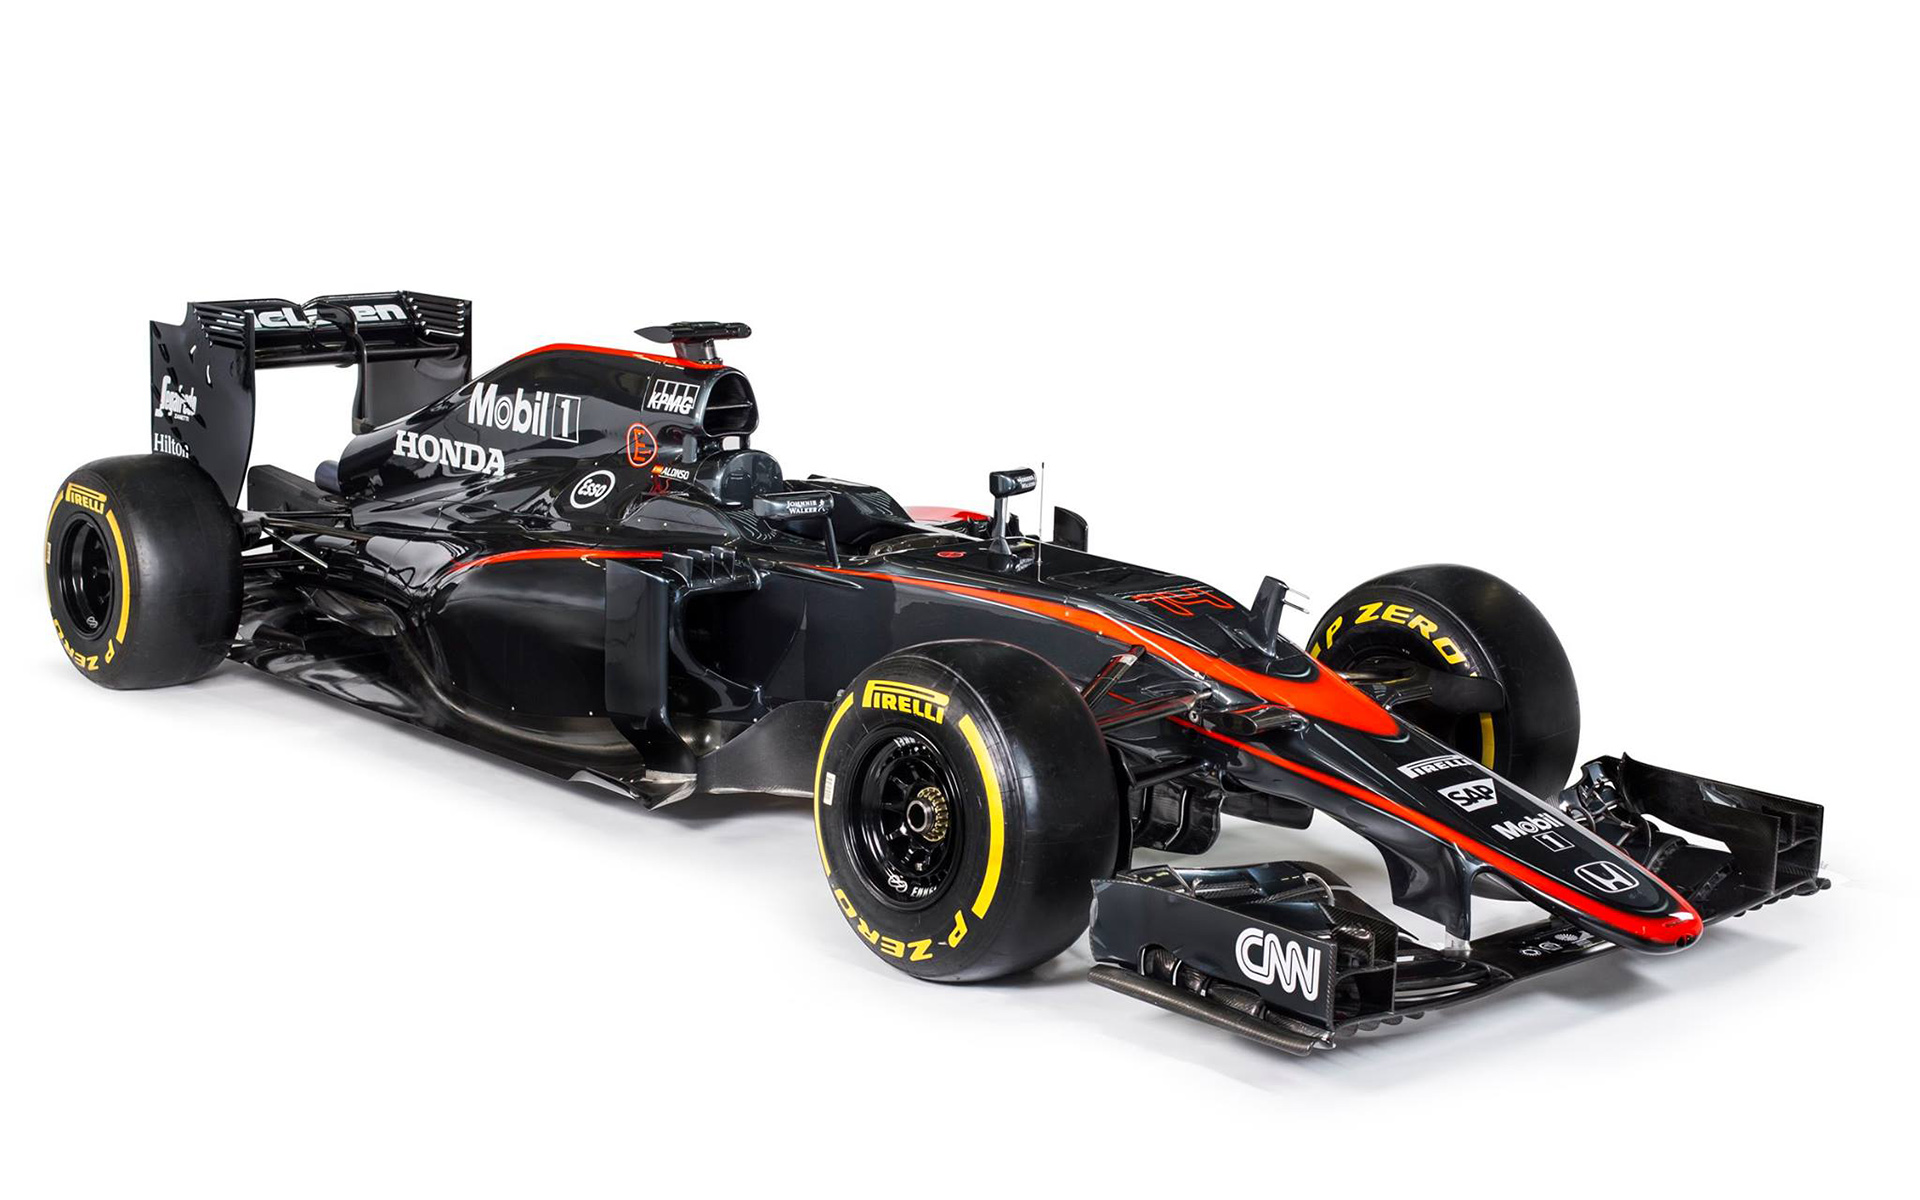 Mclaren Formula 1 Wallpaper 2015 4